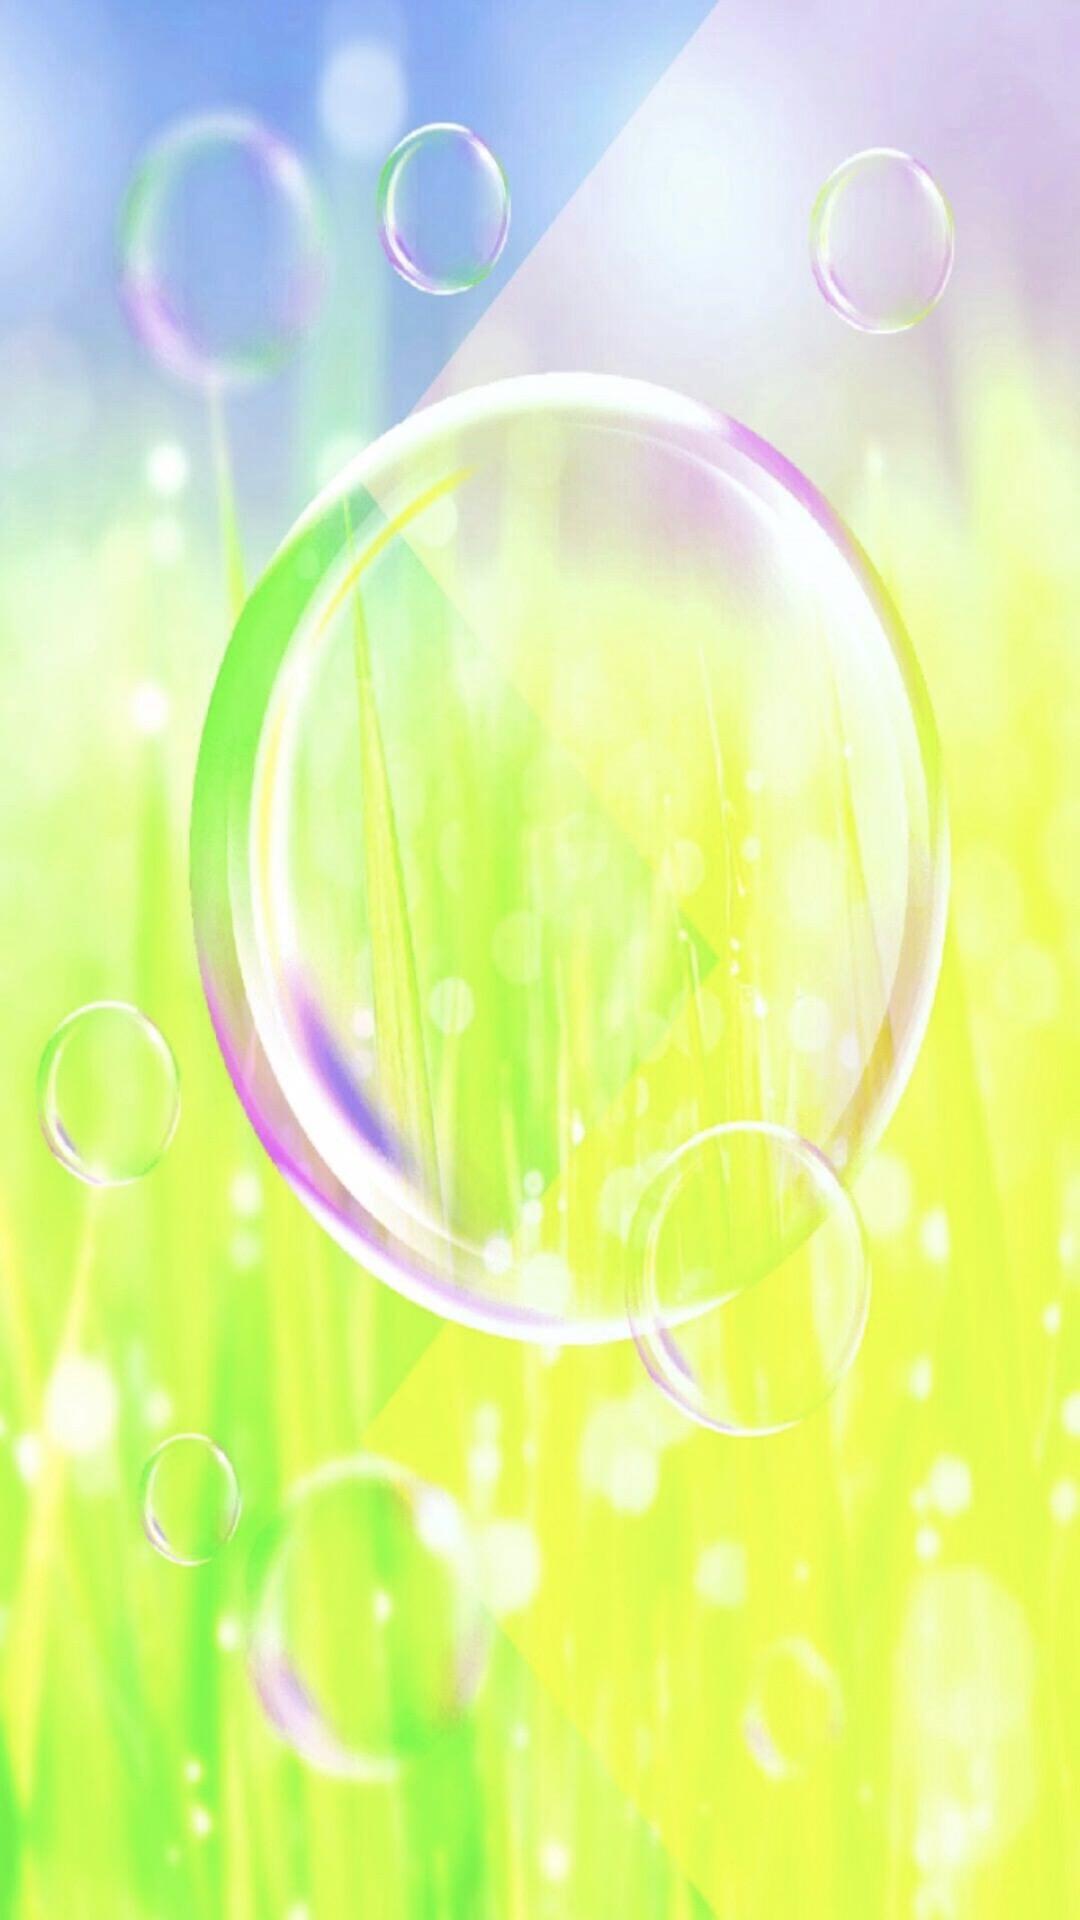 Soap Bubble Grass Wallpapersc Smartphone